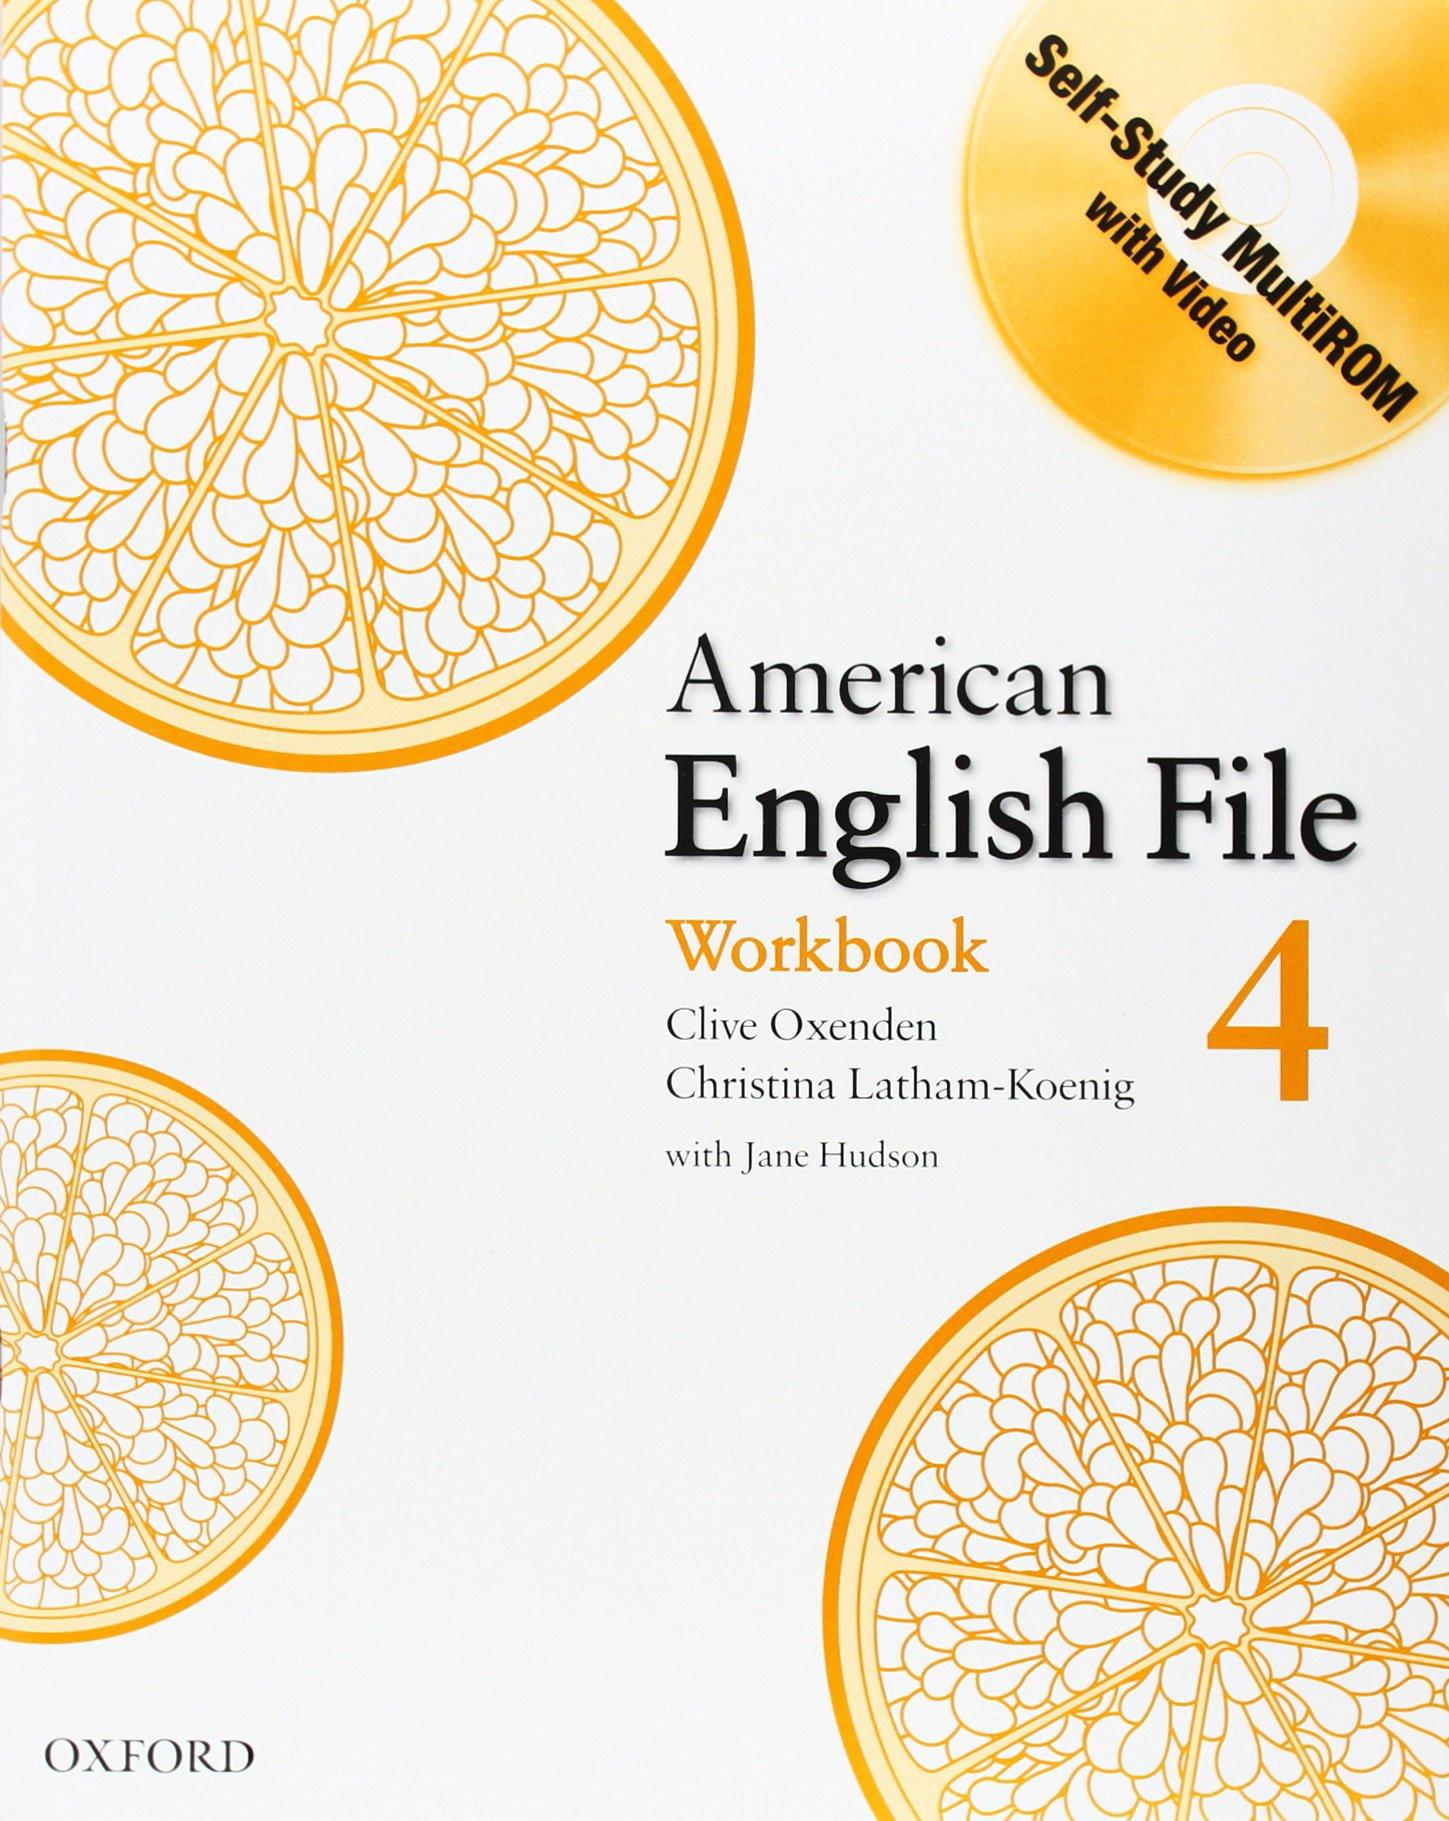 American English File 4 Workbook (+ CD-ROM)